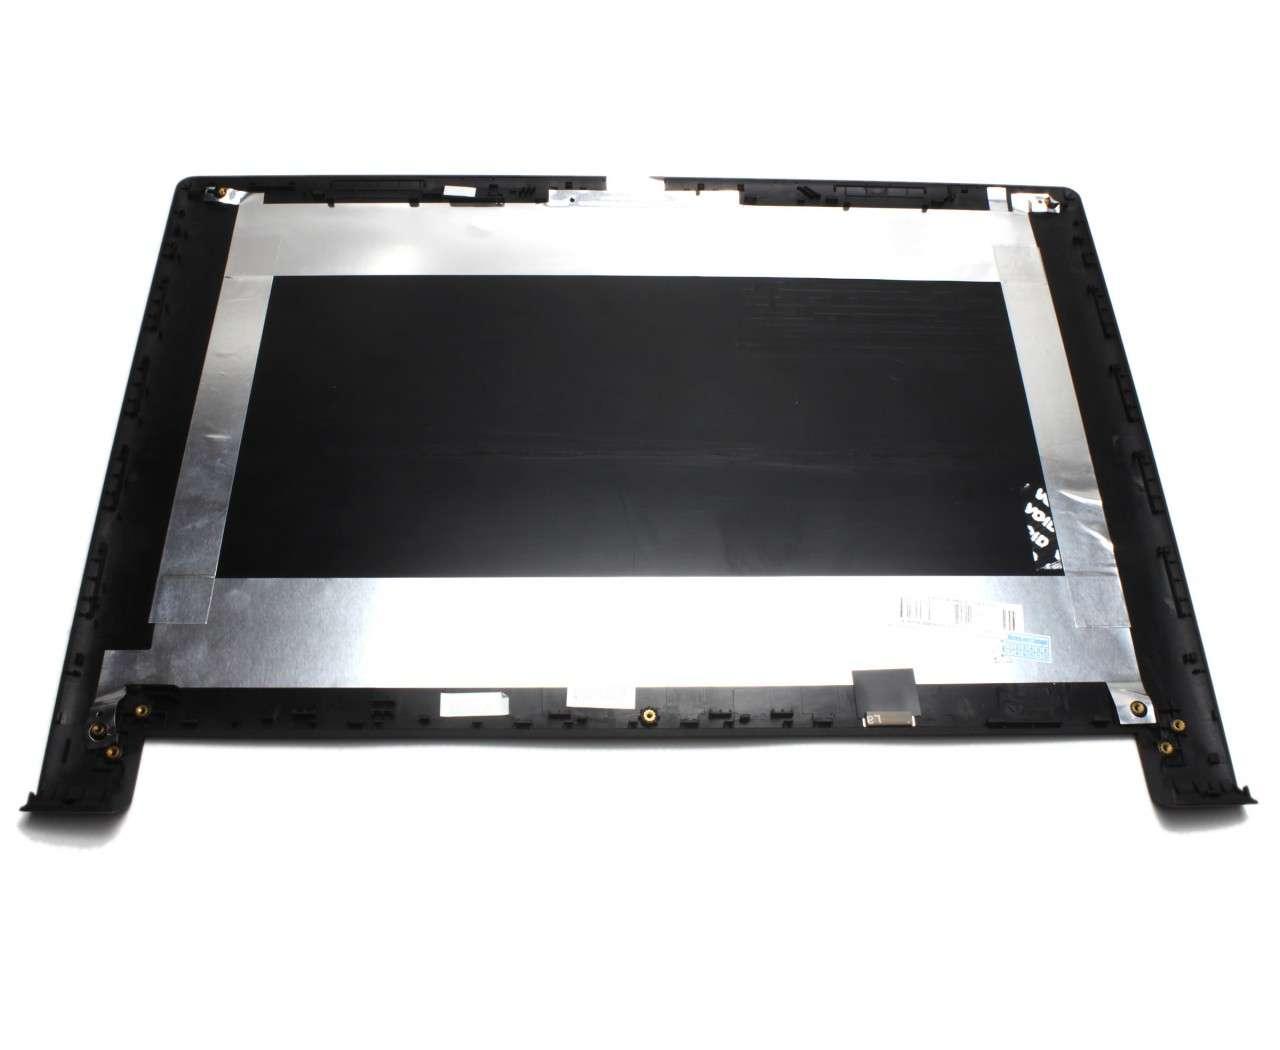 Capac Display BackCover Lenovo IdeaPad Flex 2 15D Carcasa Display imagine